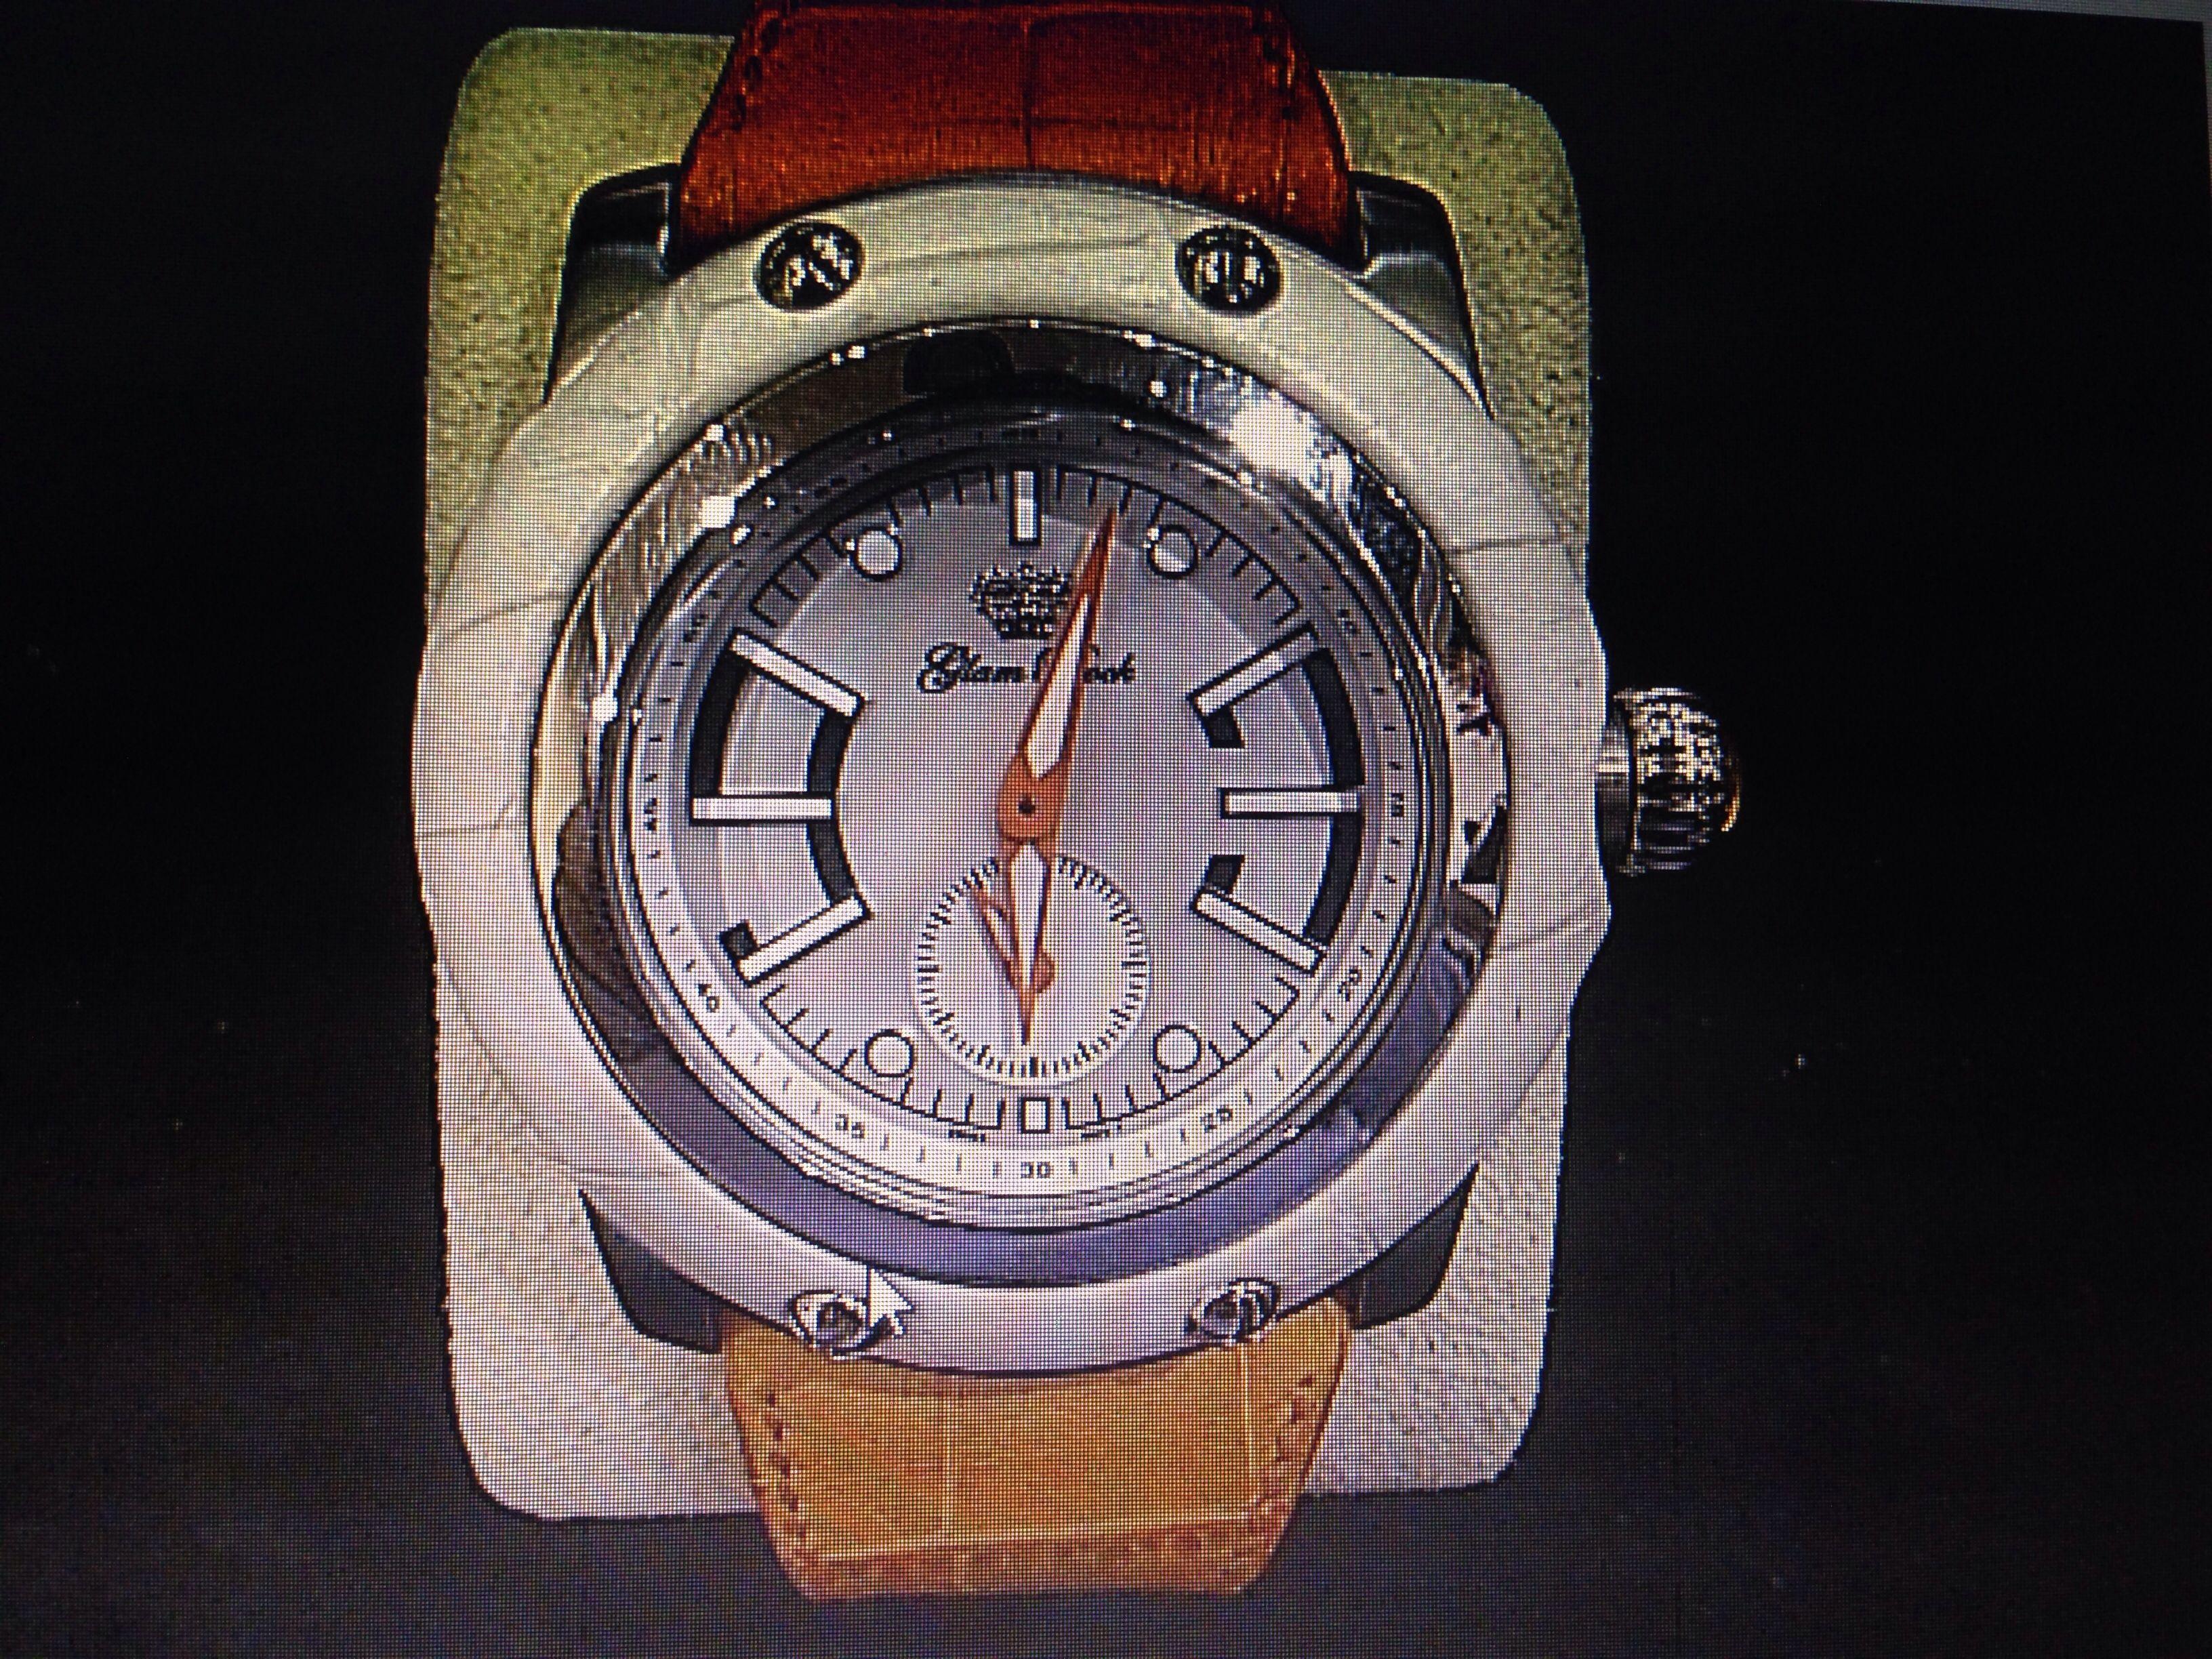 Glam rock basic with orange bracelet and white dial quartz